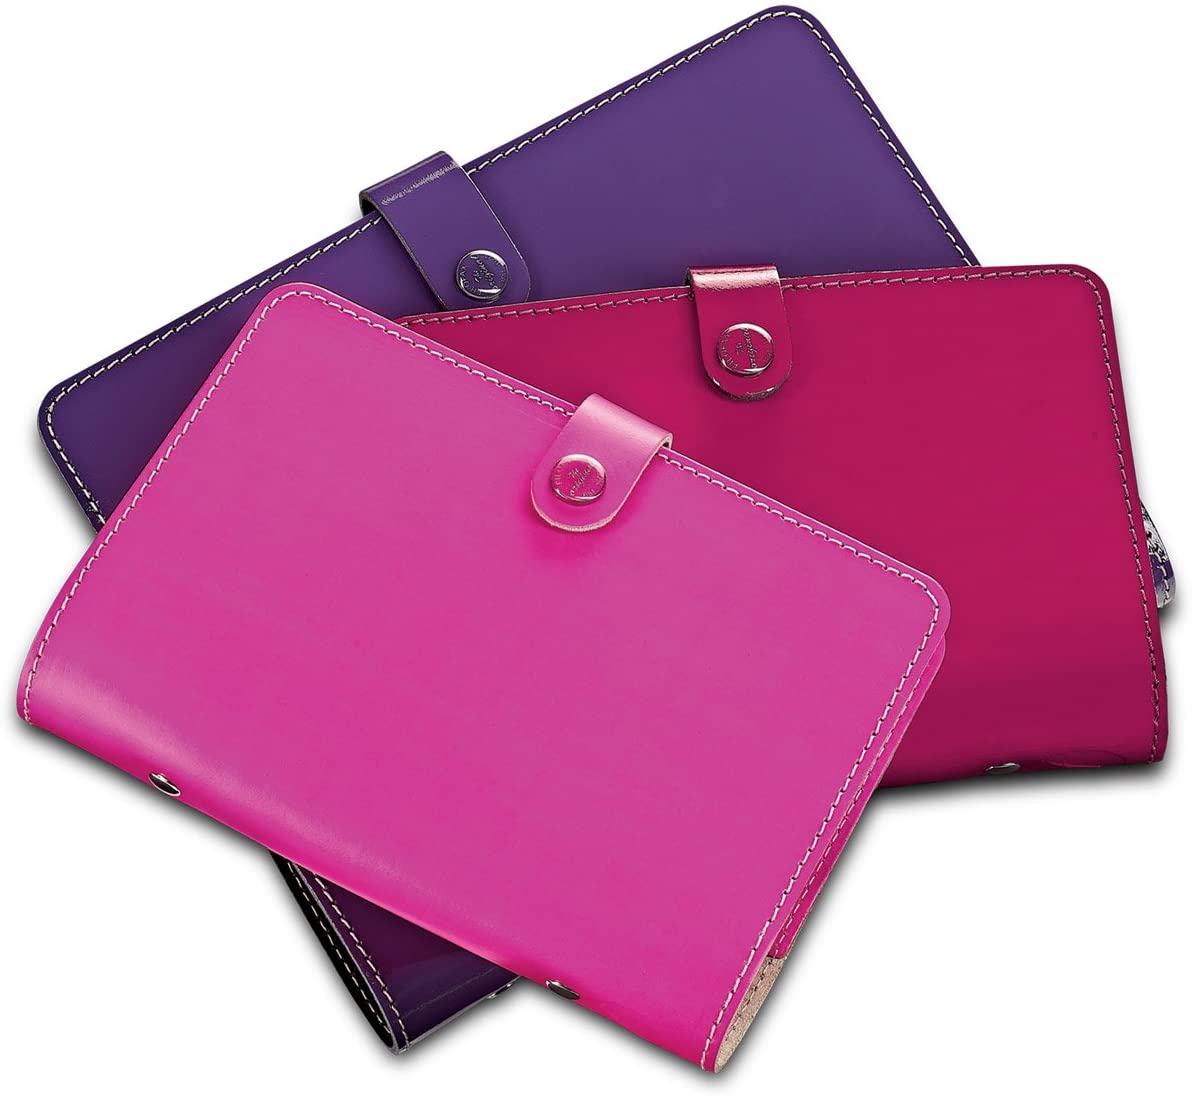 Agenda Organiser Original A5 Fluro Pink FILOFAX